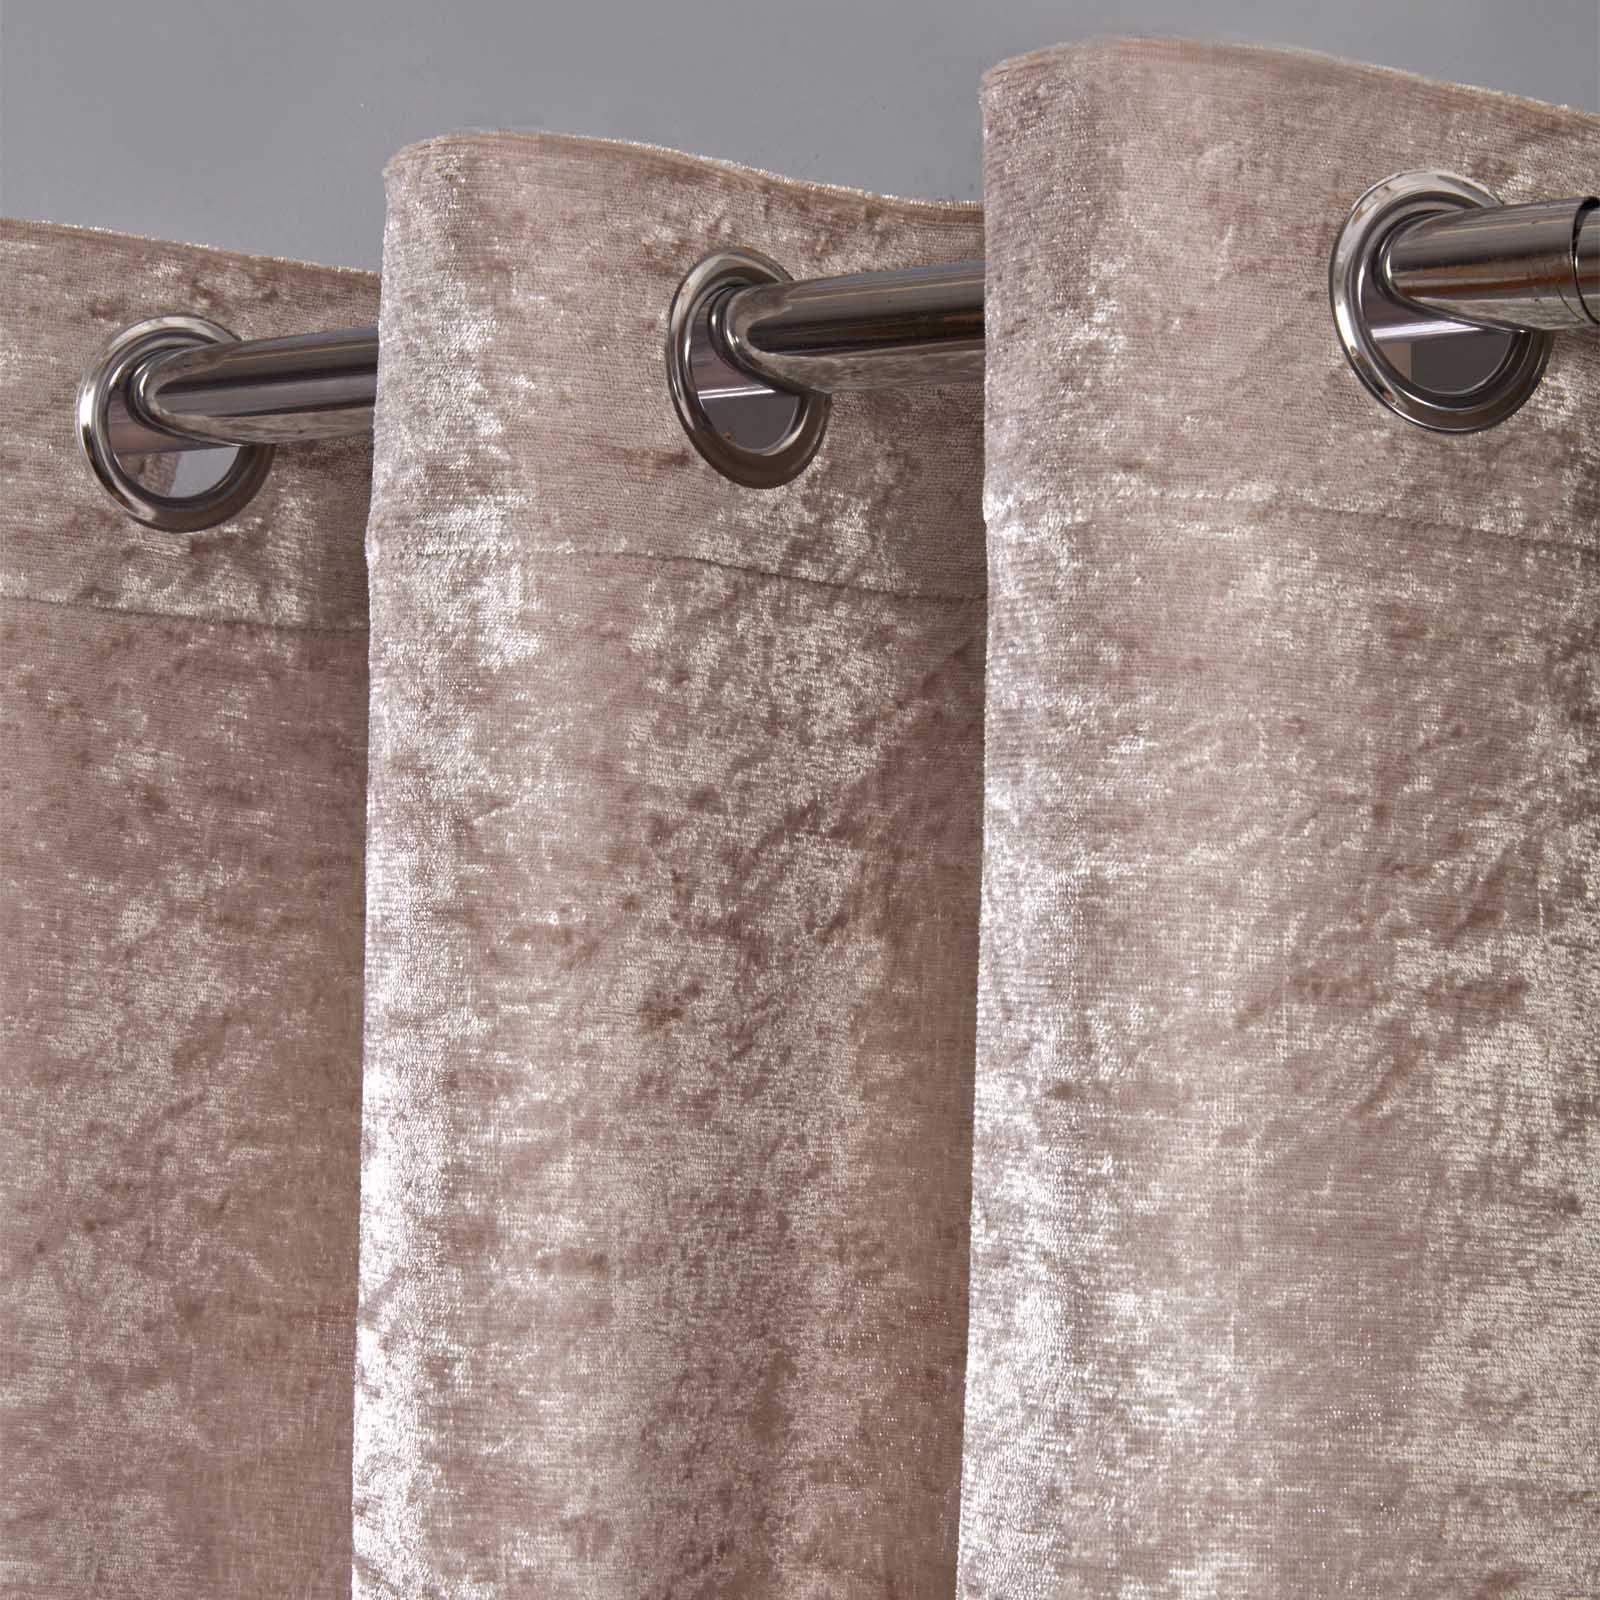 Sienna-Crushed-Velvet-Voile-PAIR-of-Net-Eyelet-Ring-Top-Curtains-Blush-Silver thumbnail 14